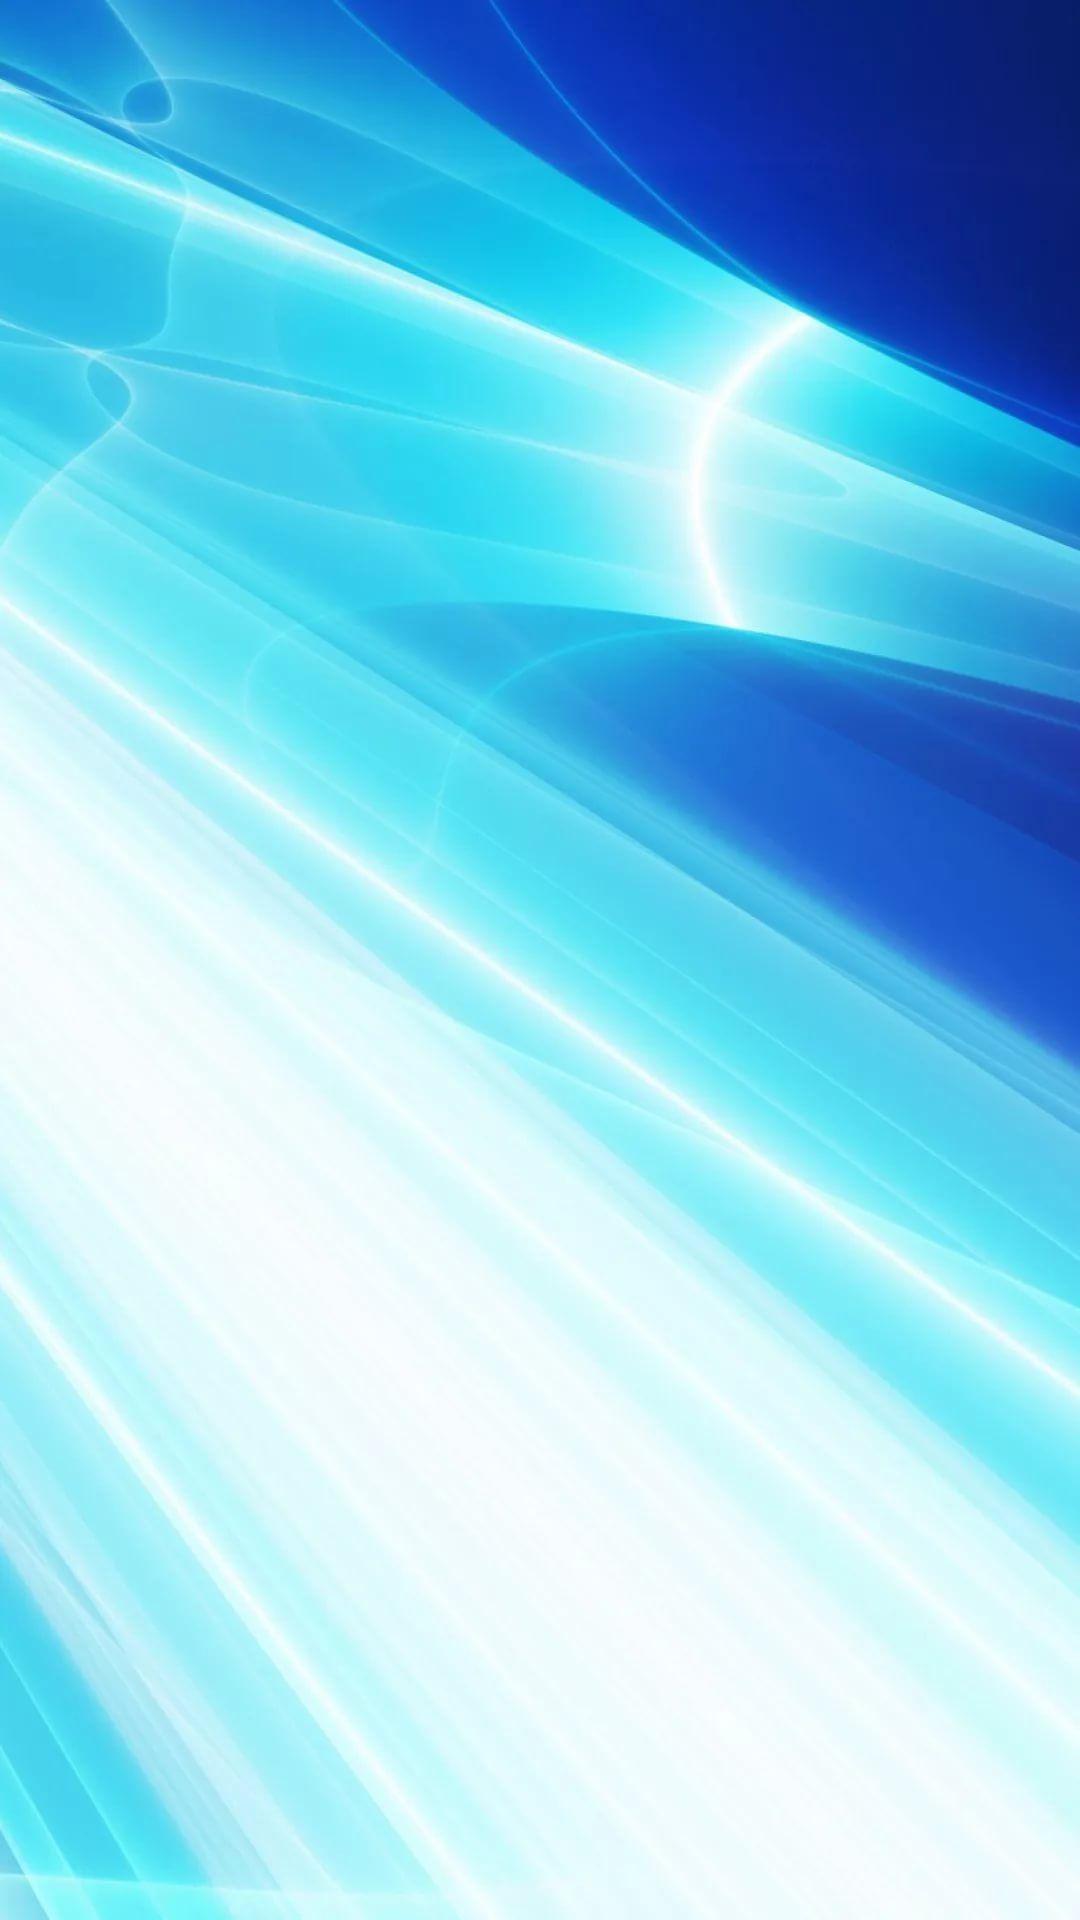 Light Blue phone background